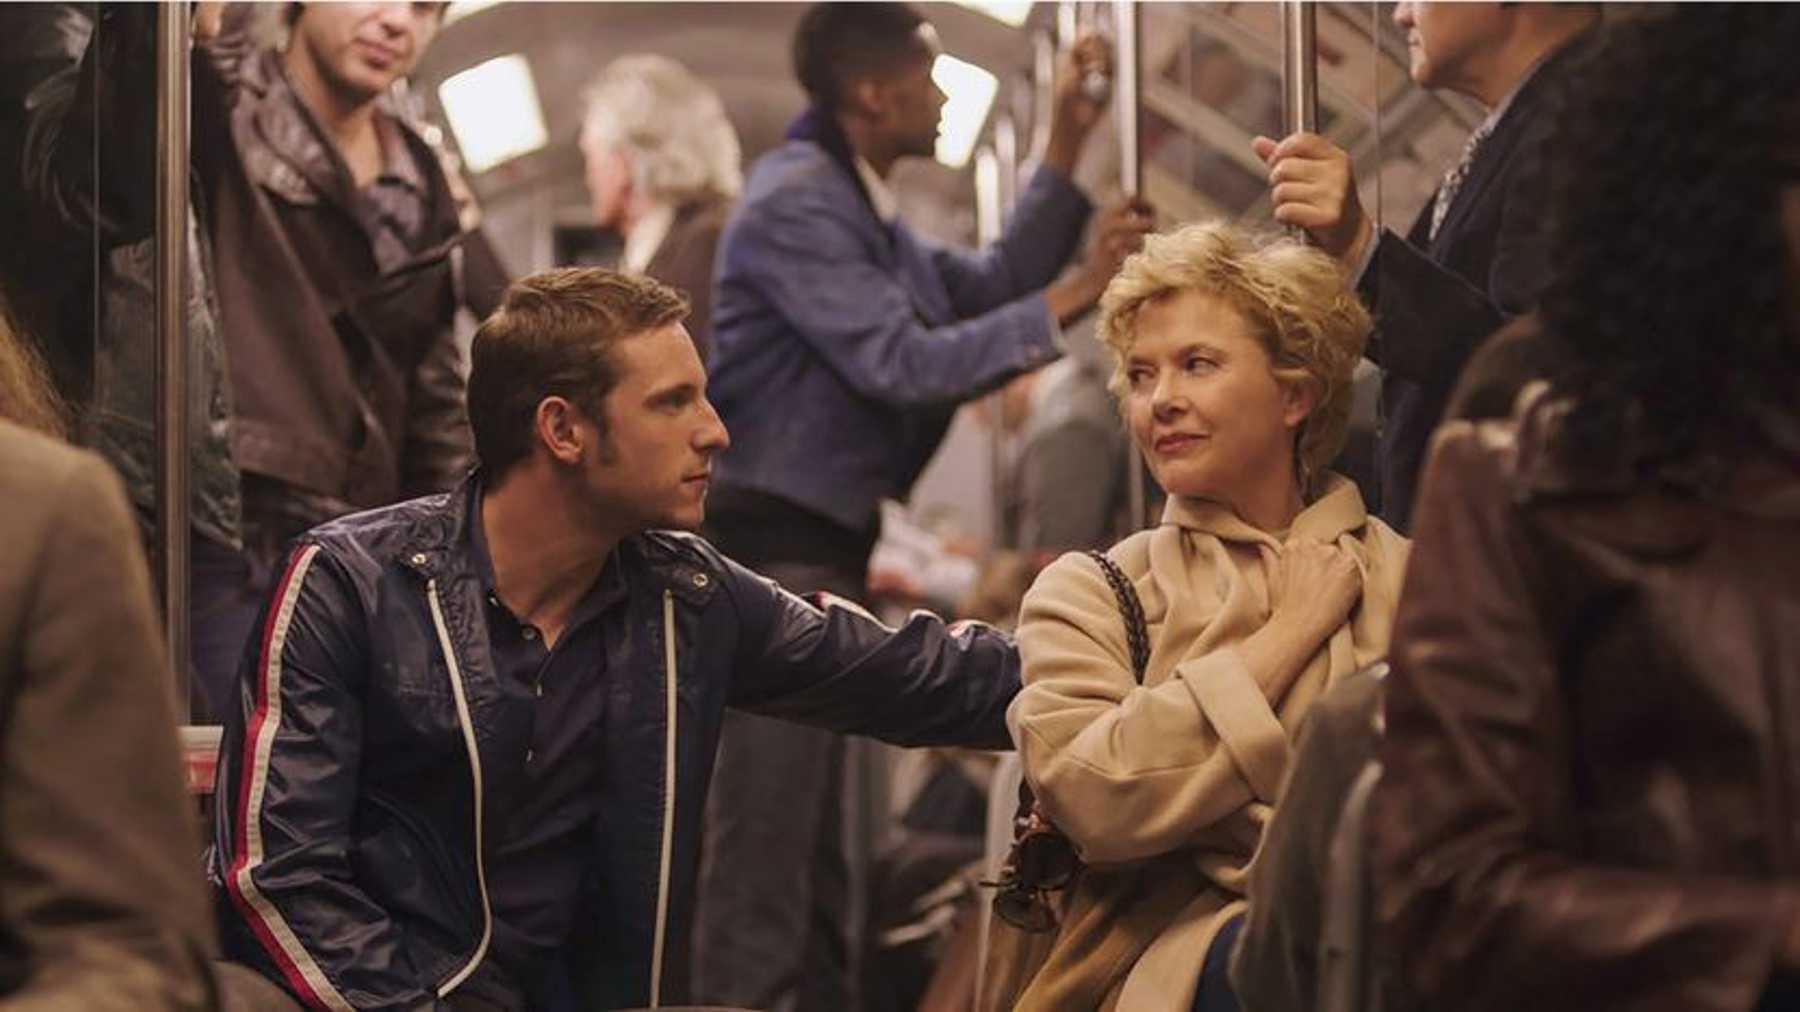 Hollywood Różnica wieku randki